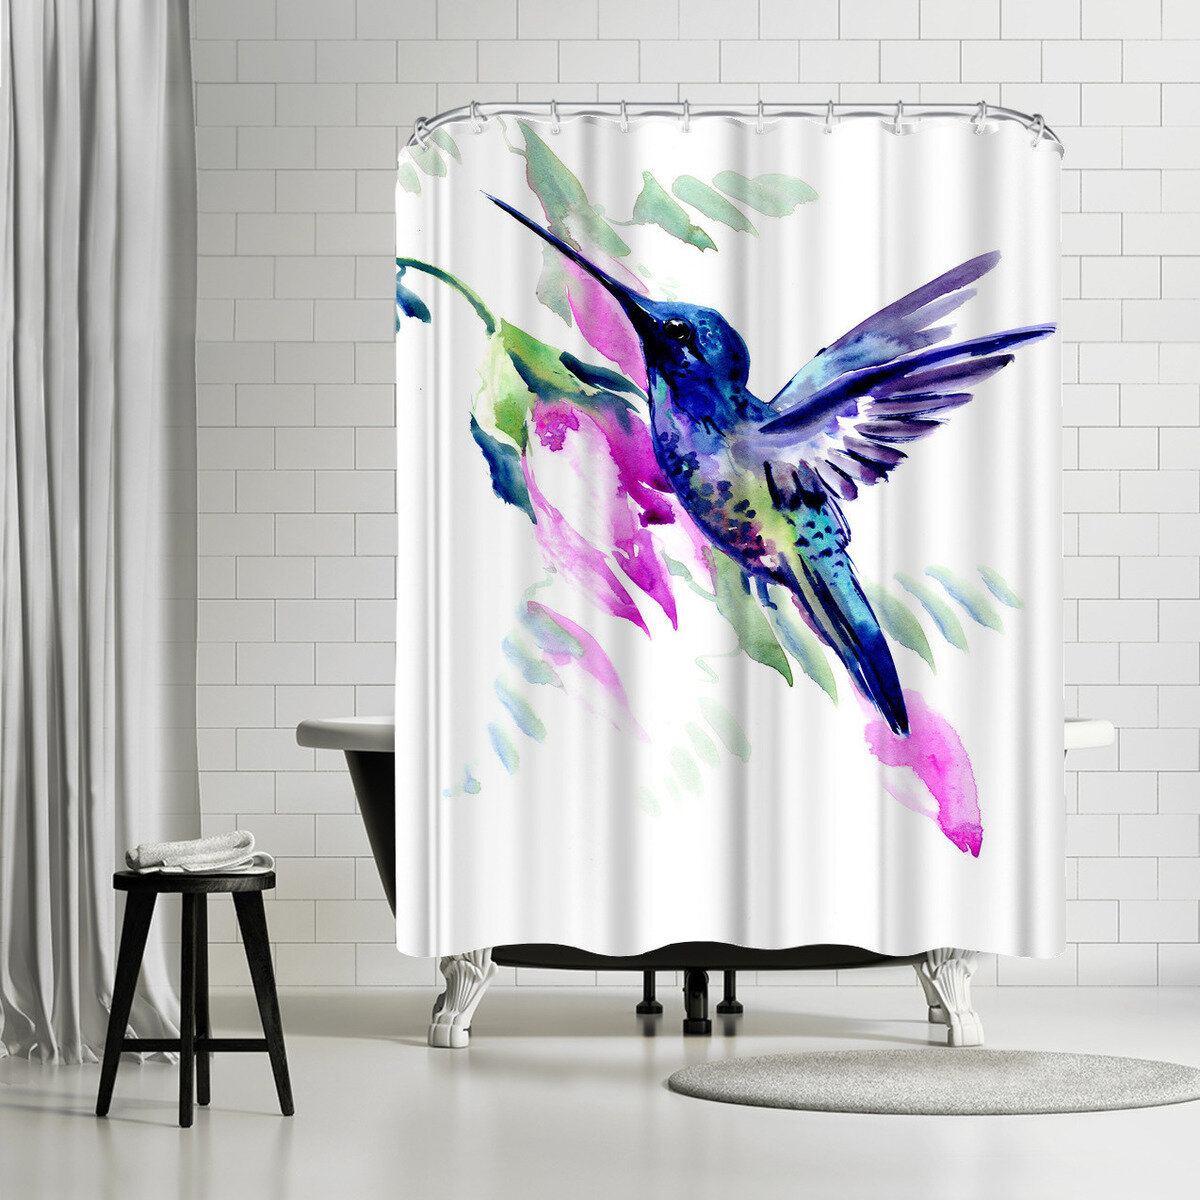 East Urban Home Suren Nersisyan Hummingbird And Pink Flowers Single Shower Curtain Wayfair